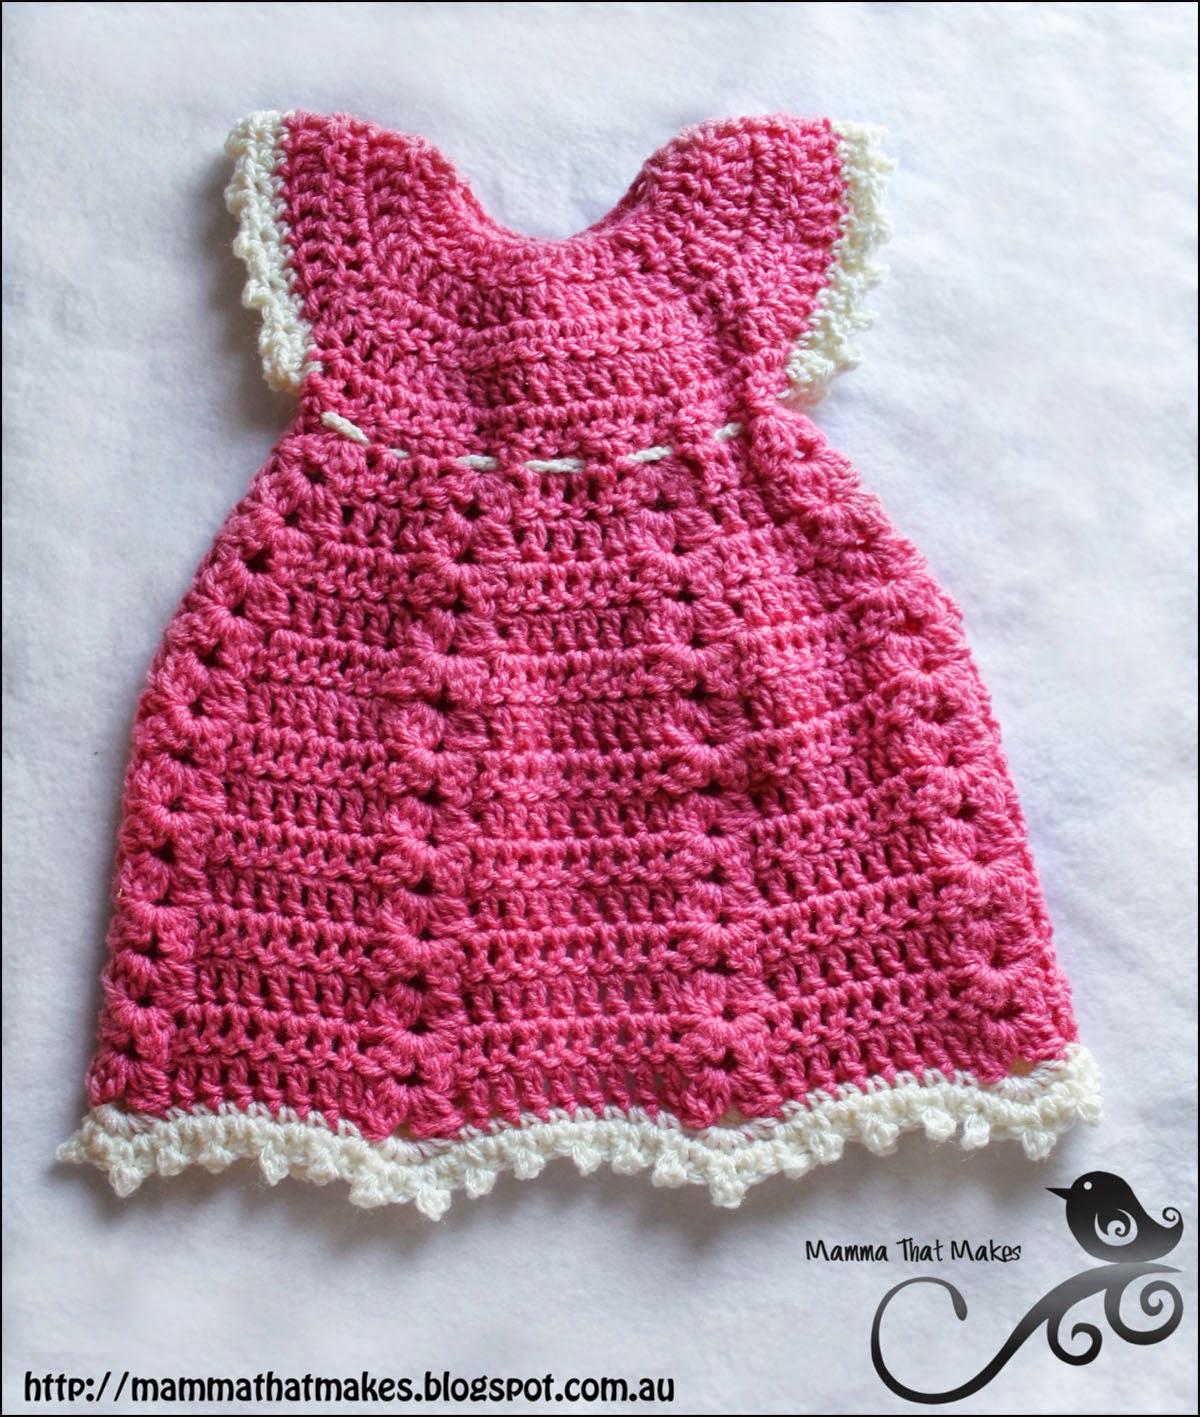 Free Baby Crochet Pattern Dress And Bolero : Mamma That Makes: Sophia Gown - Free Crochet Pattern